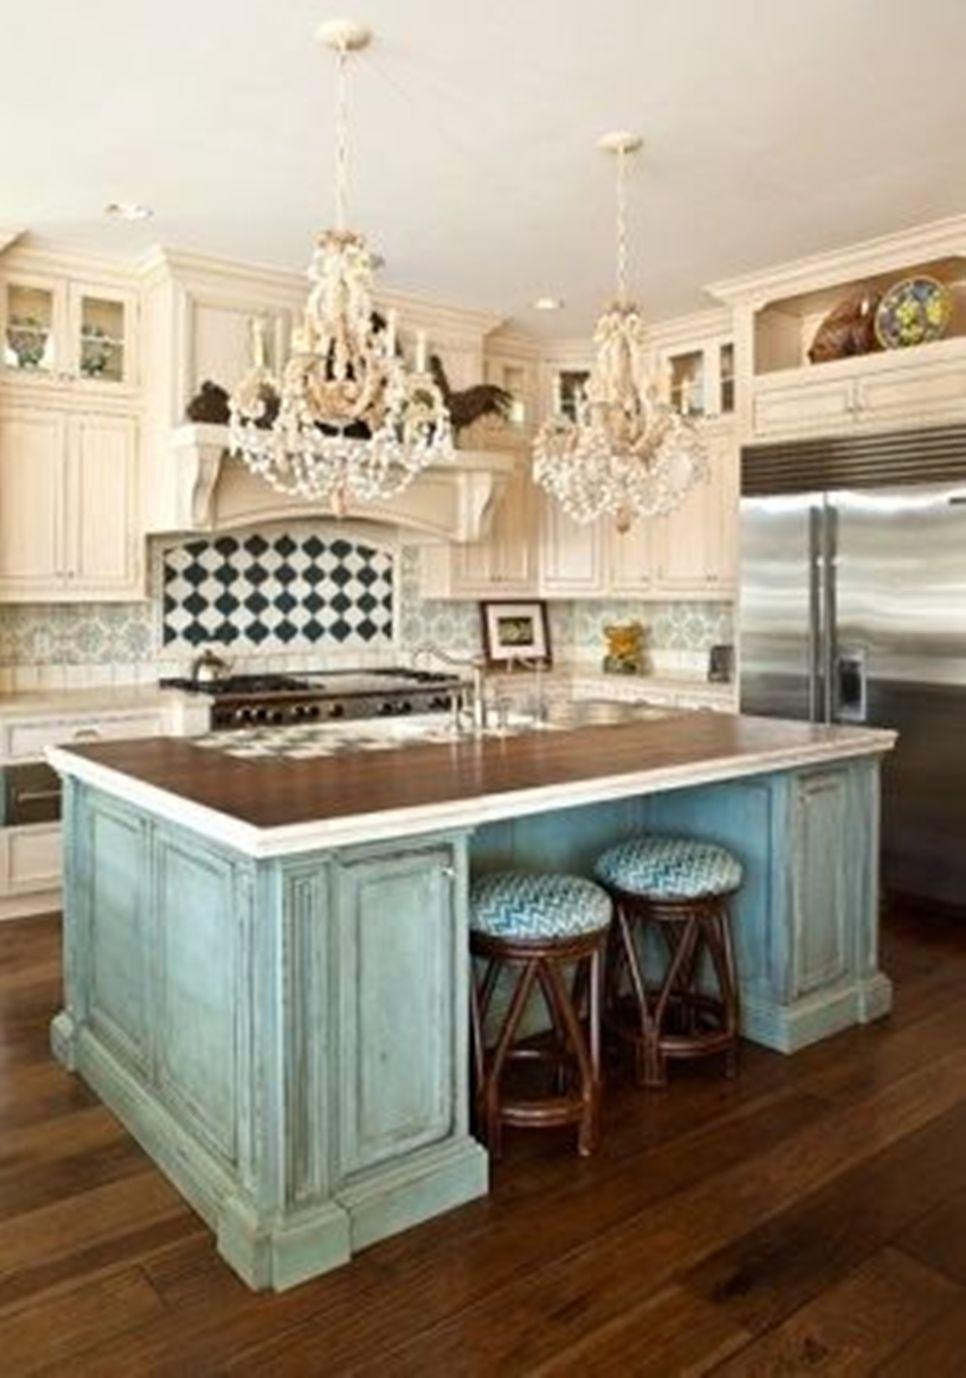 Kitchen Room Shabby Chic Tile Backsplash Overlooking Pretentious Chandeliers Over Turquoise Island Design Ideas Elegant Brown Wood